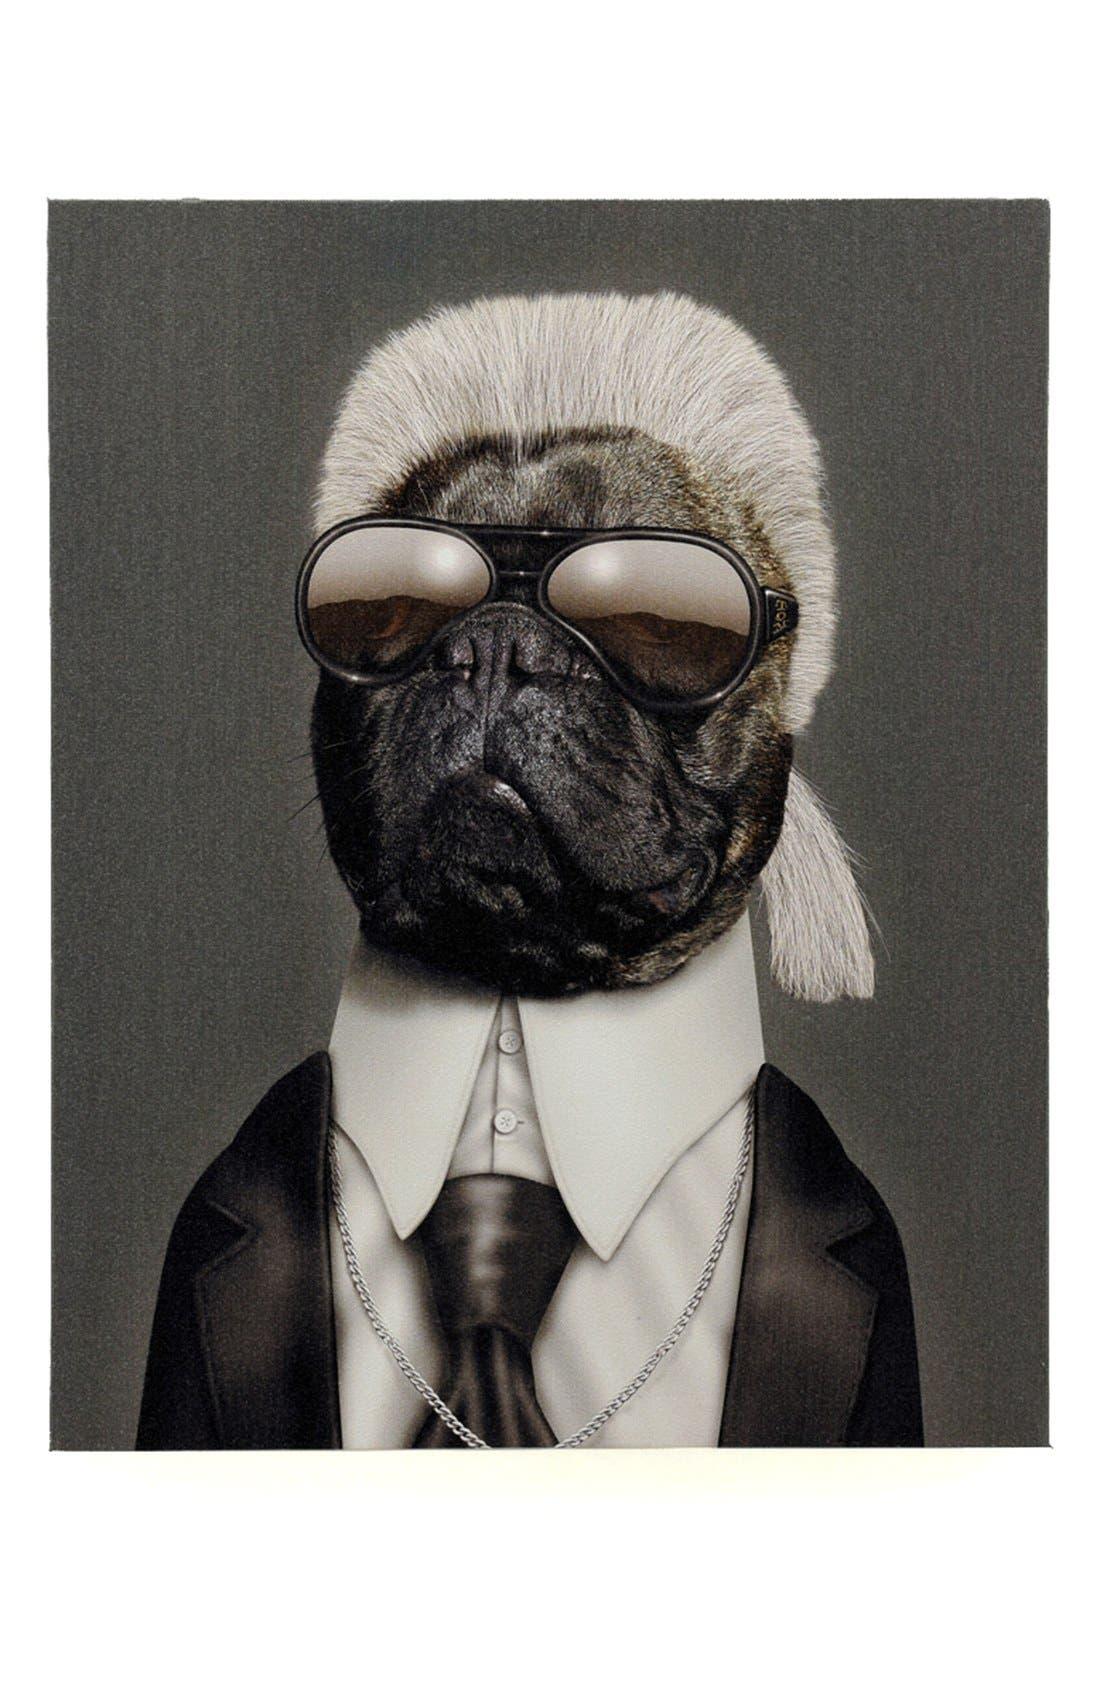 Main Image - Empire Art Direct 'Pets Rock™ - Fashion' Giclée Wall Art